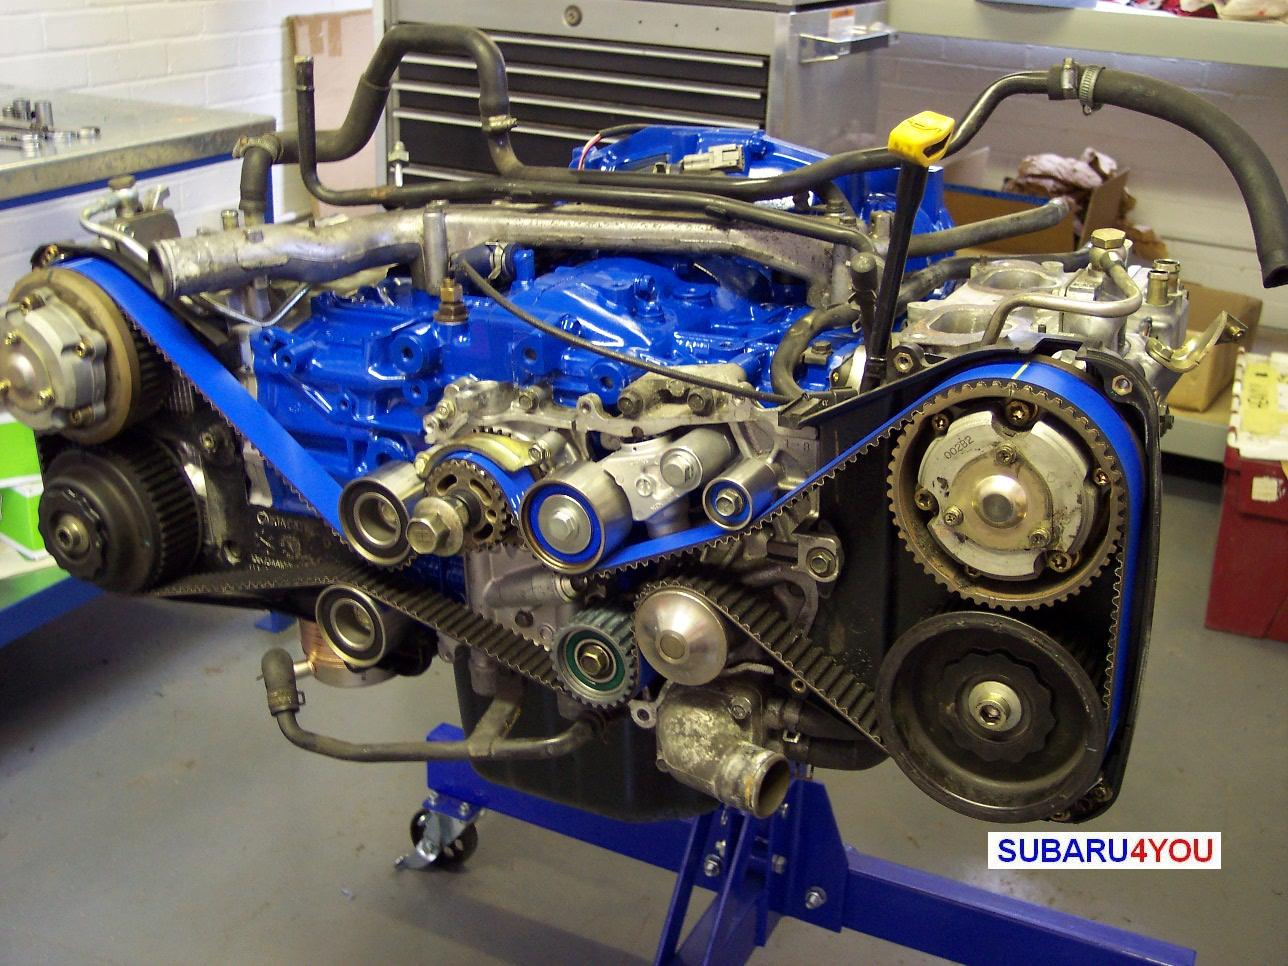 hight resolution of subaru performance upgrades gearbox rebuild engine rebuild